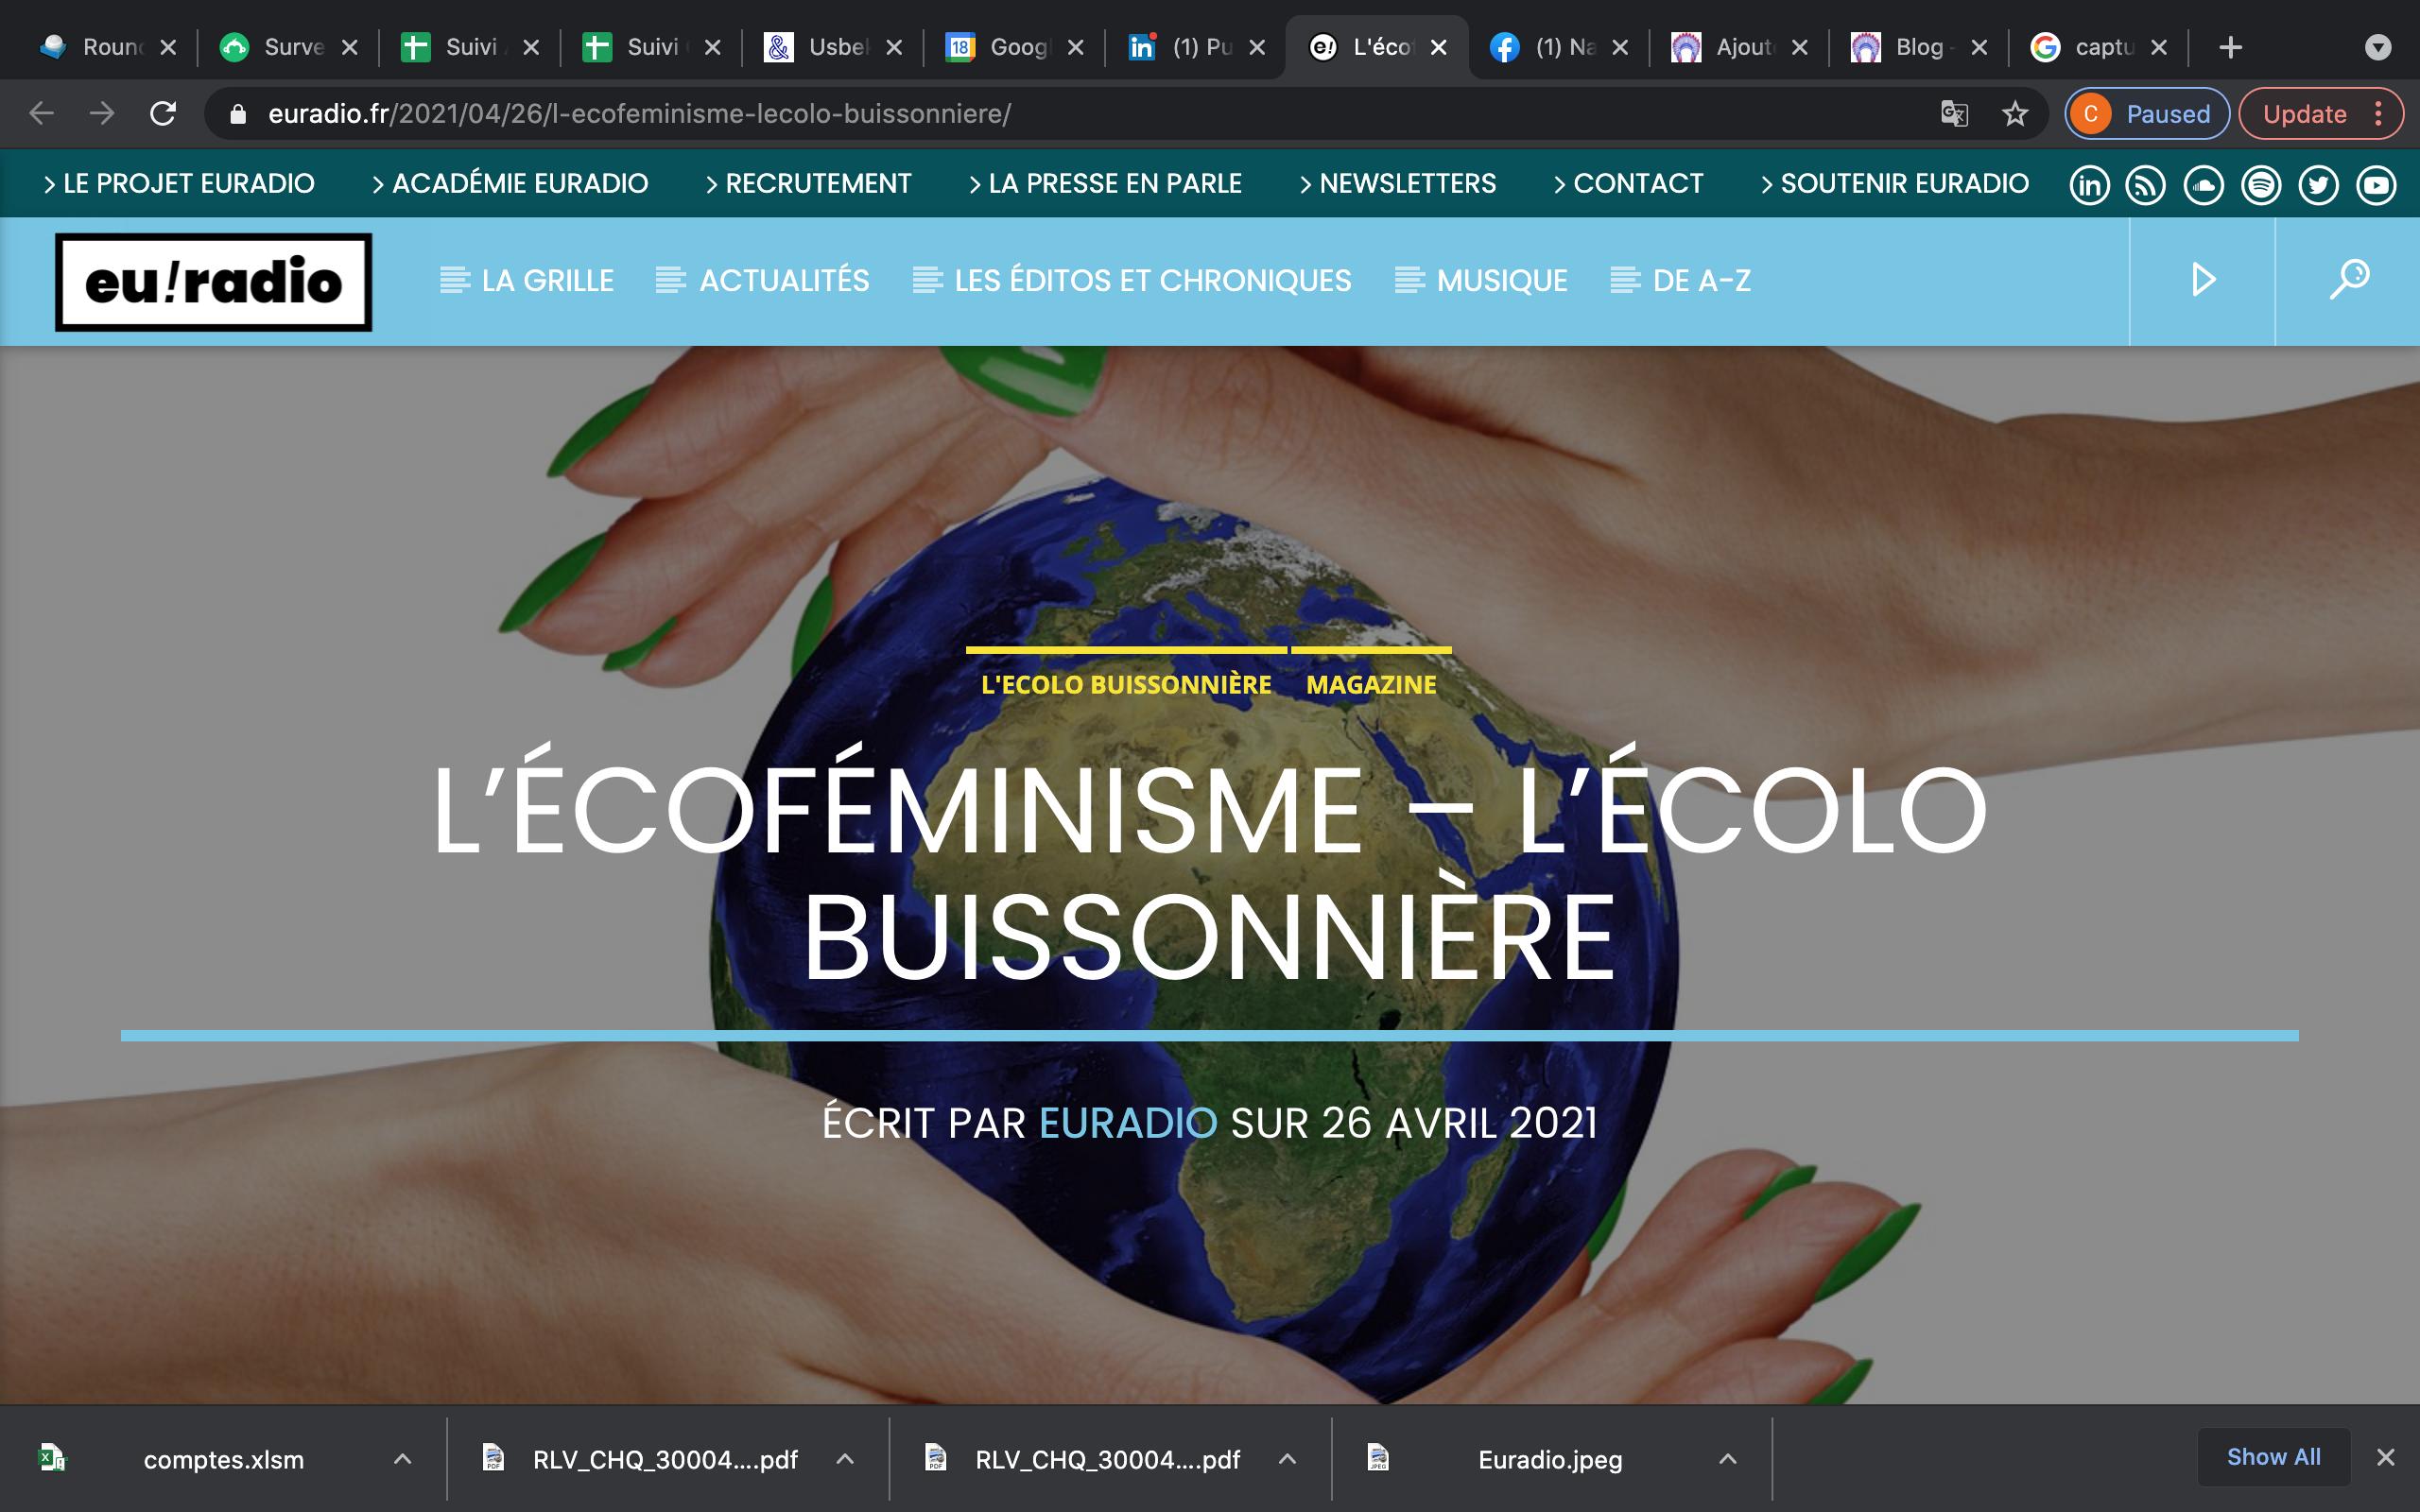 Nathalie parle écoféminisme sur Euradio